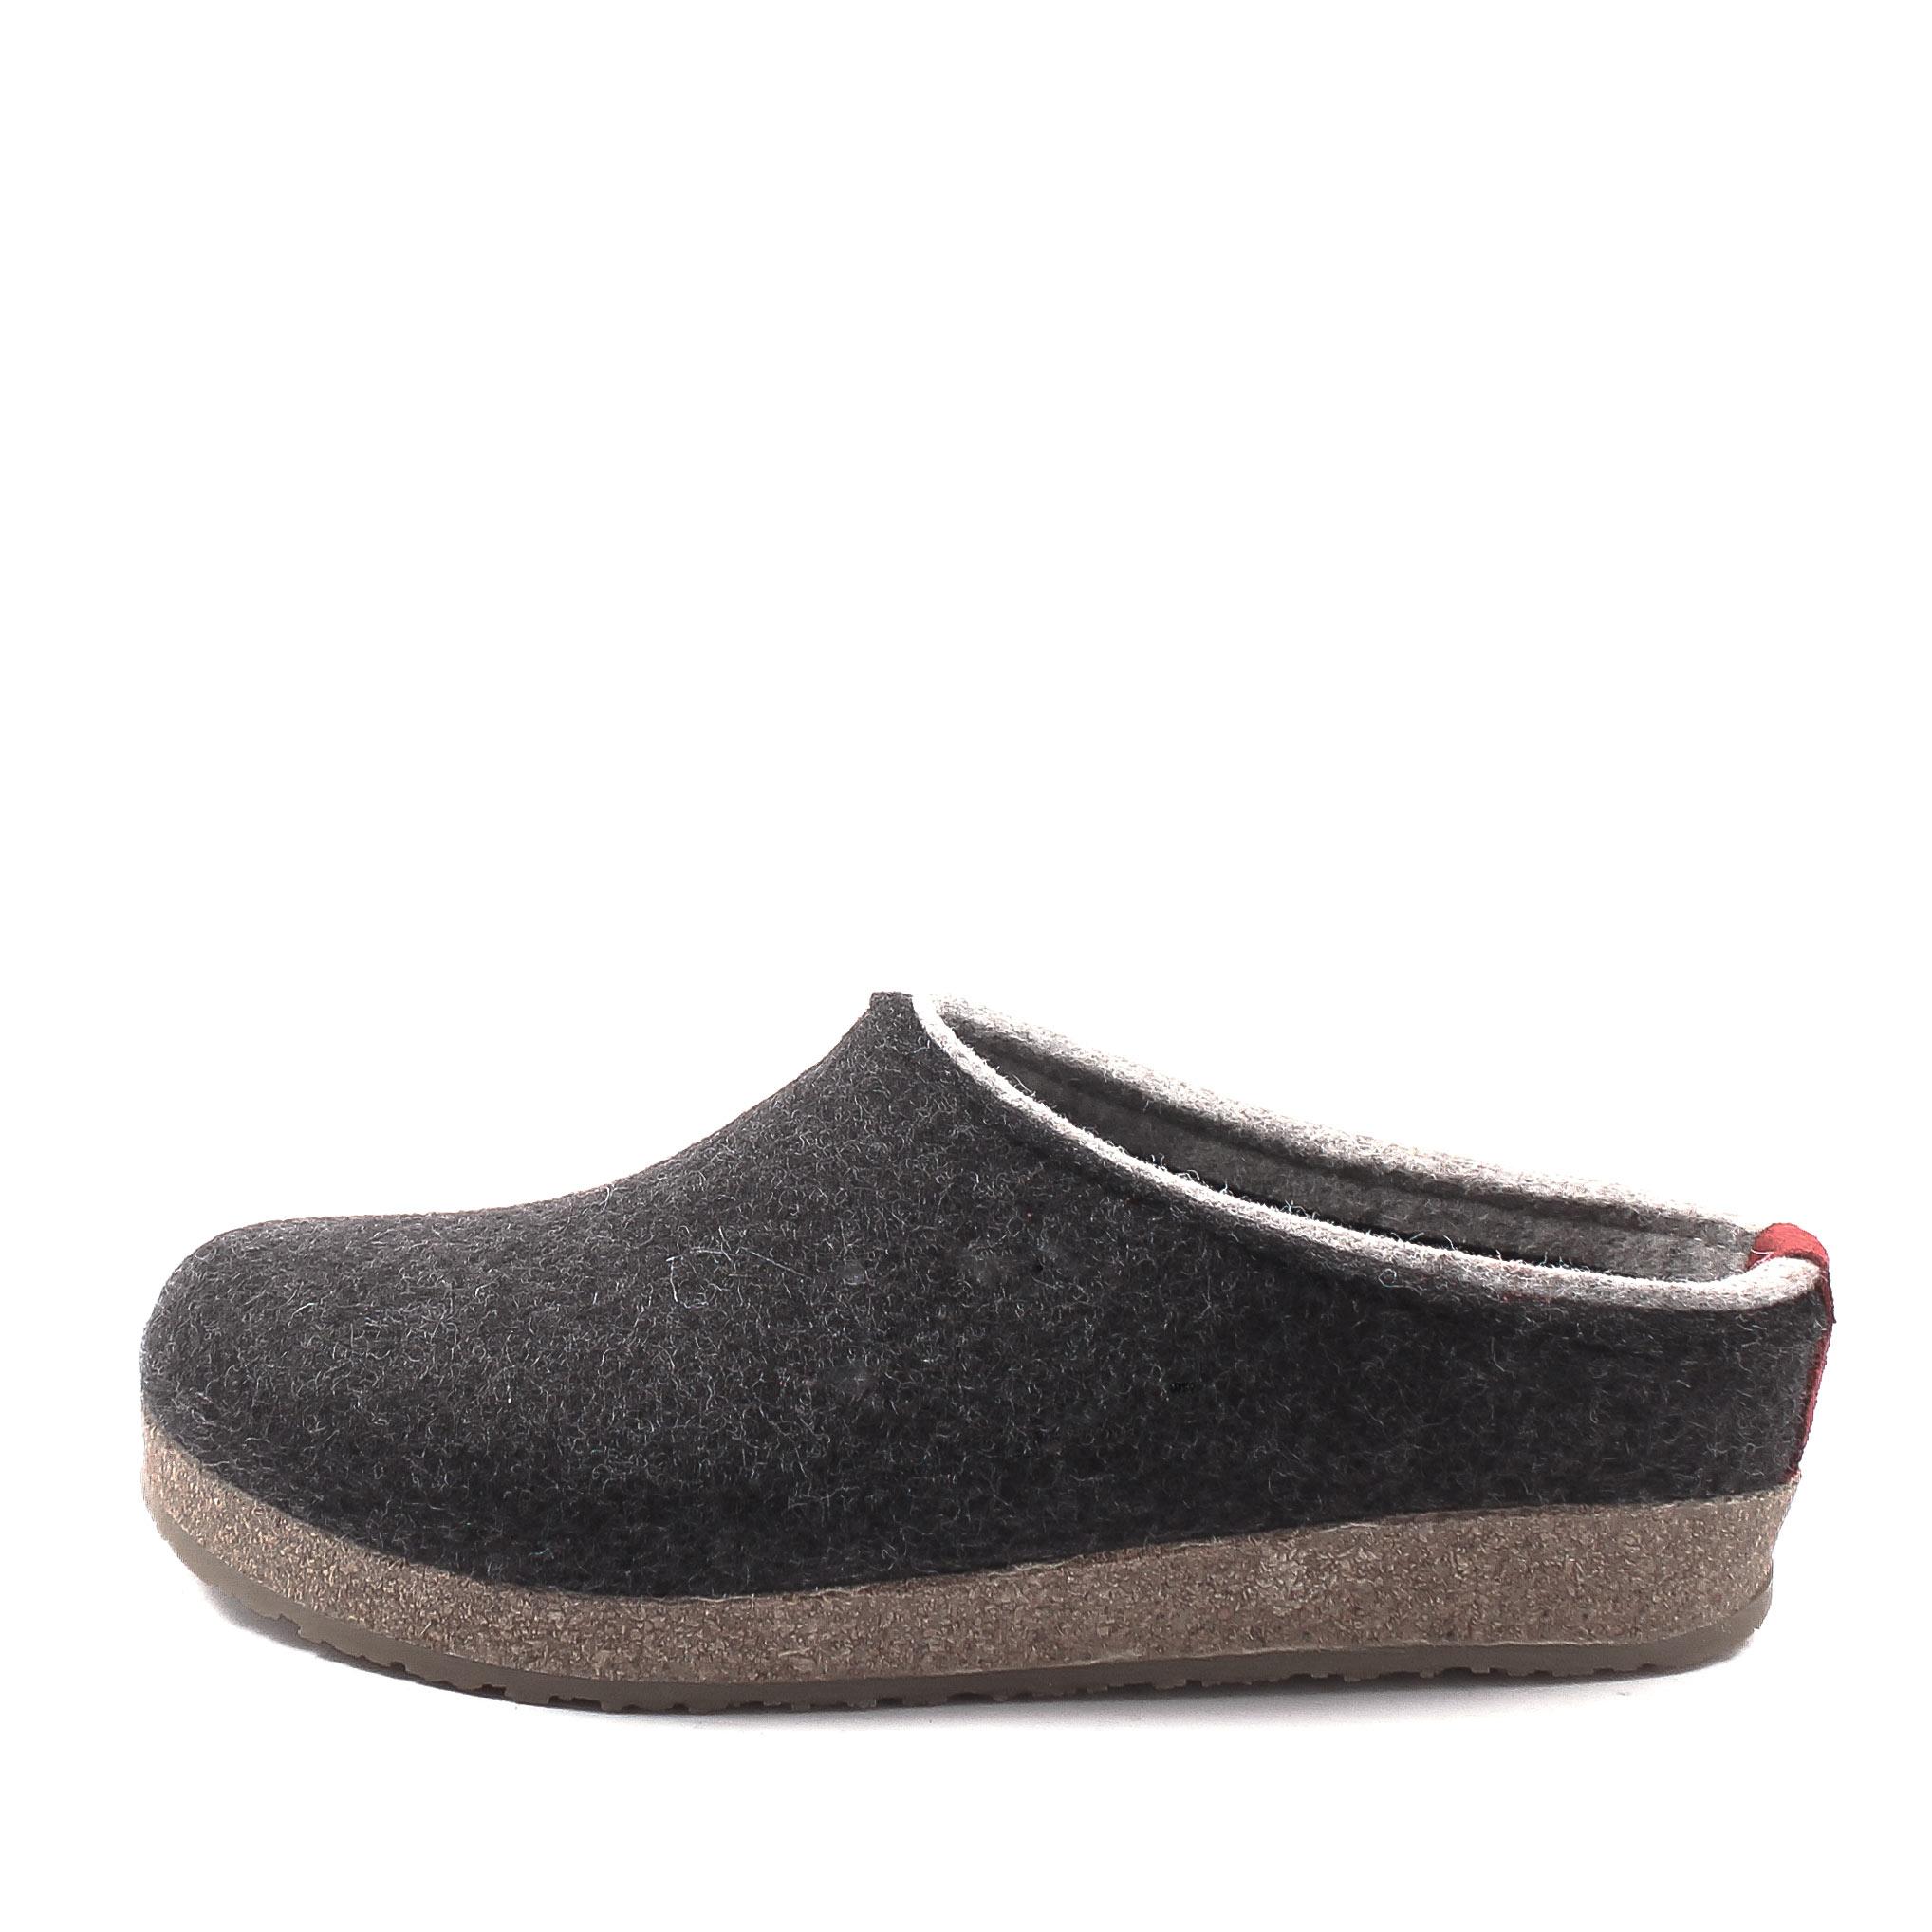 Haflinger, Grizzly Kris Unisex Carpet Slippers, anthracite Gre 36